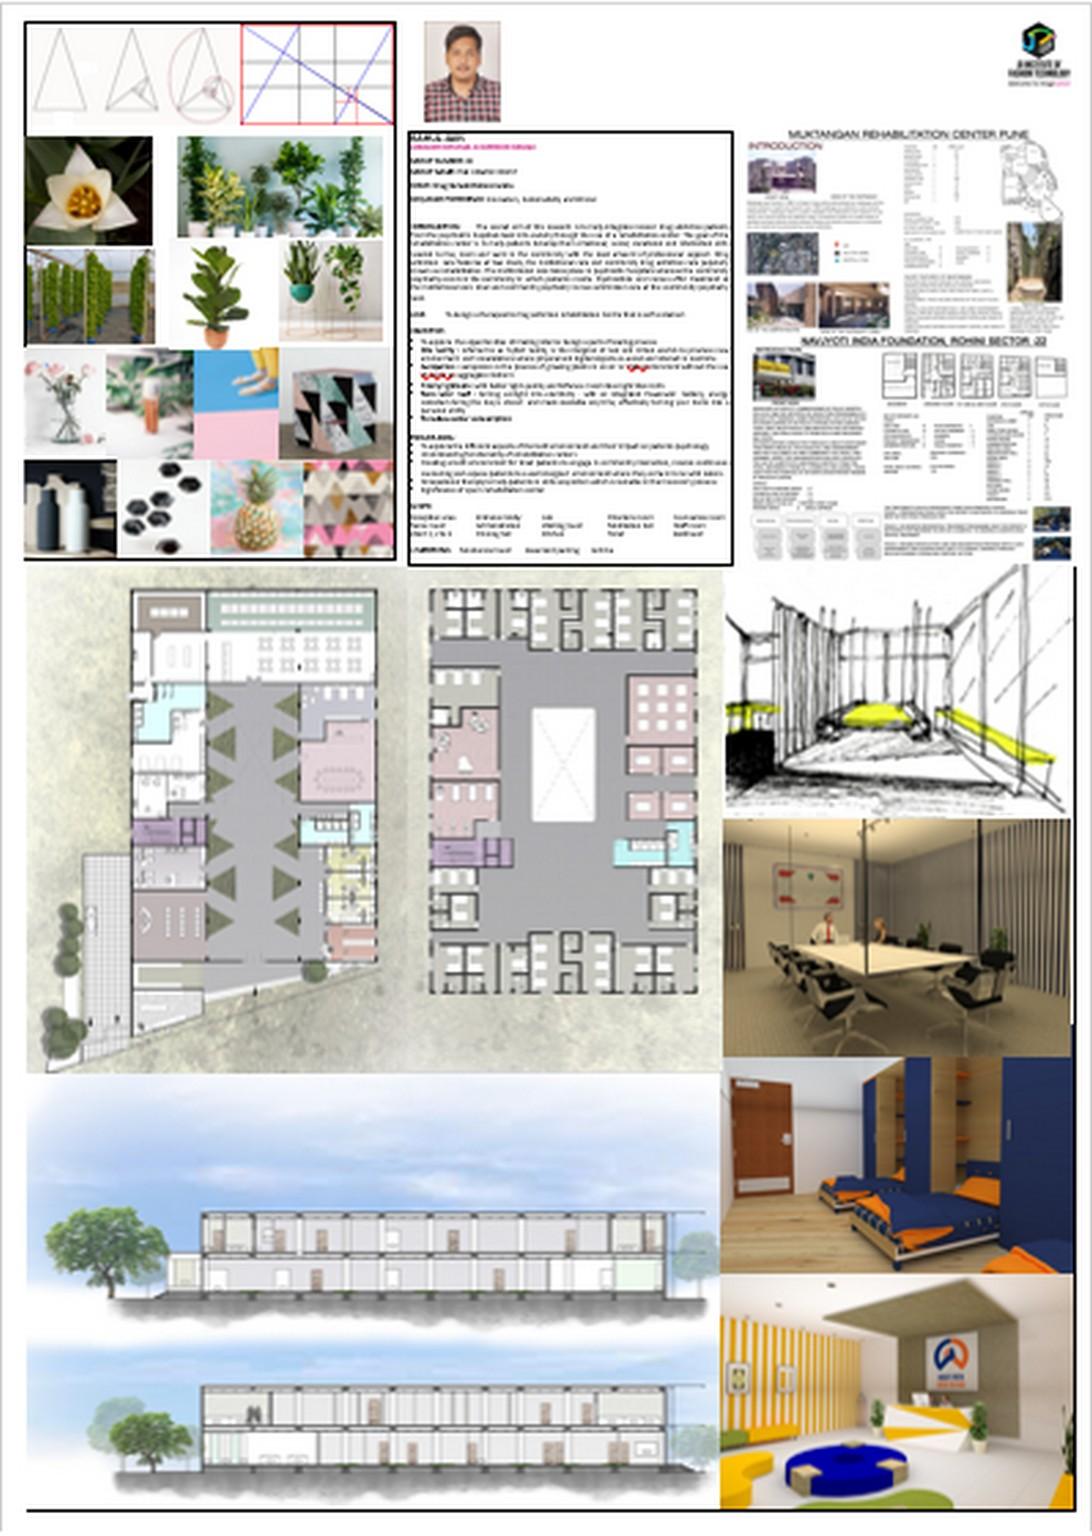 Rehabilitation Centre– Change – JD Annual Design Awards 2018 | Designer: Rahul Jain | Photography : Jerin Nath (@jerin_nath) rehabilitation centre - Rehalibation - Rehabilitation Centre– Change – JD Annual Design Awards 2018